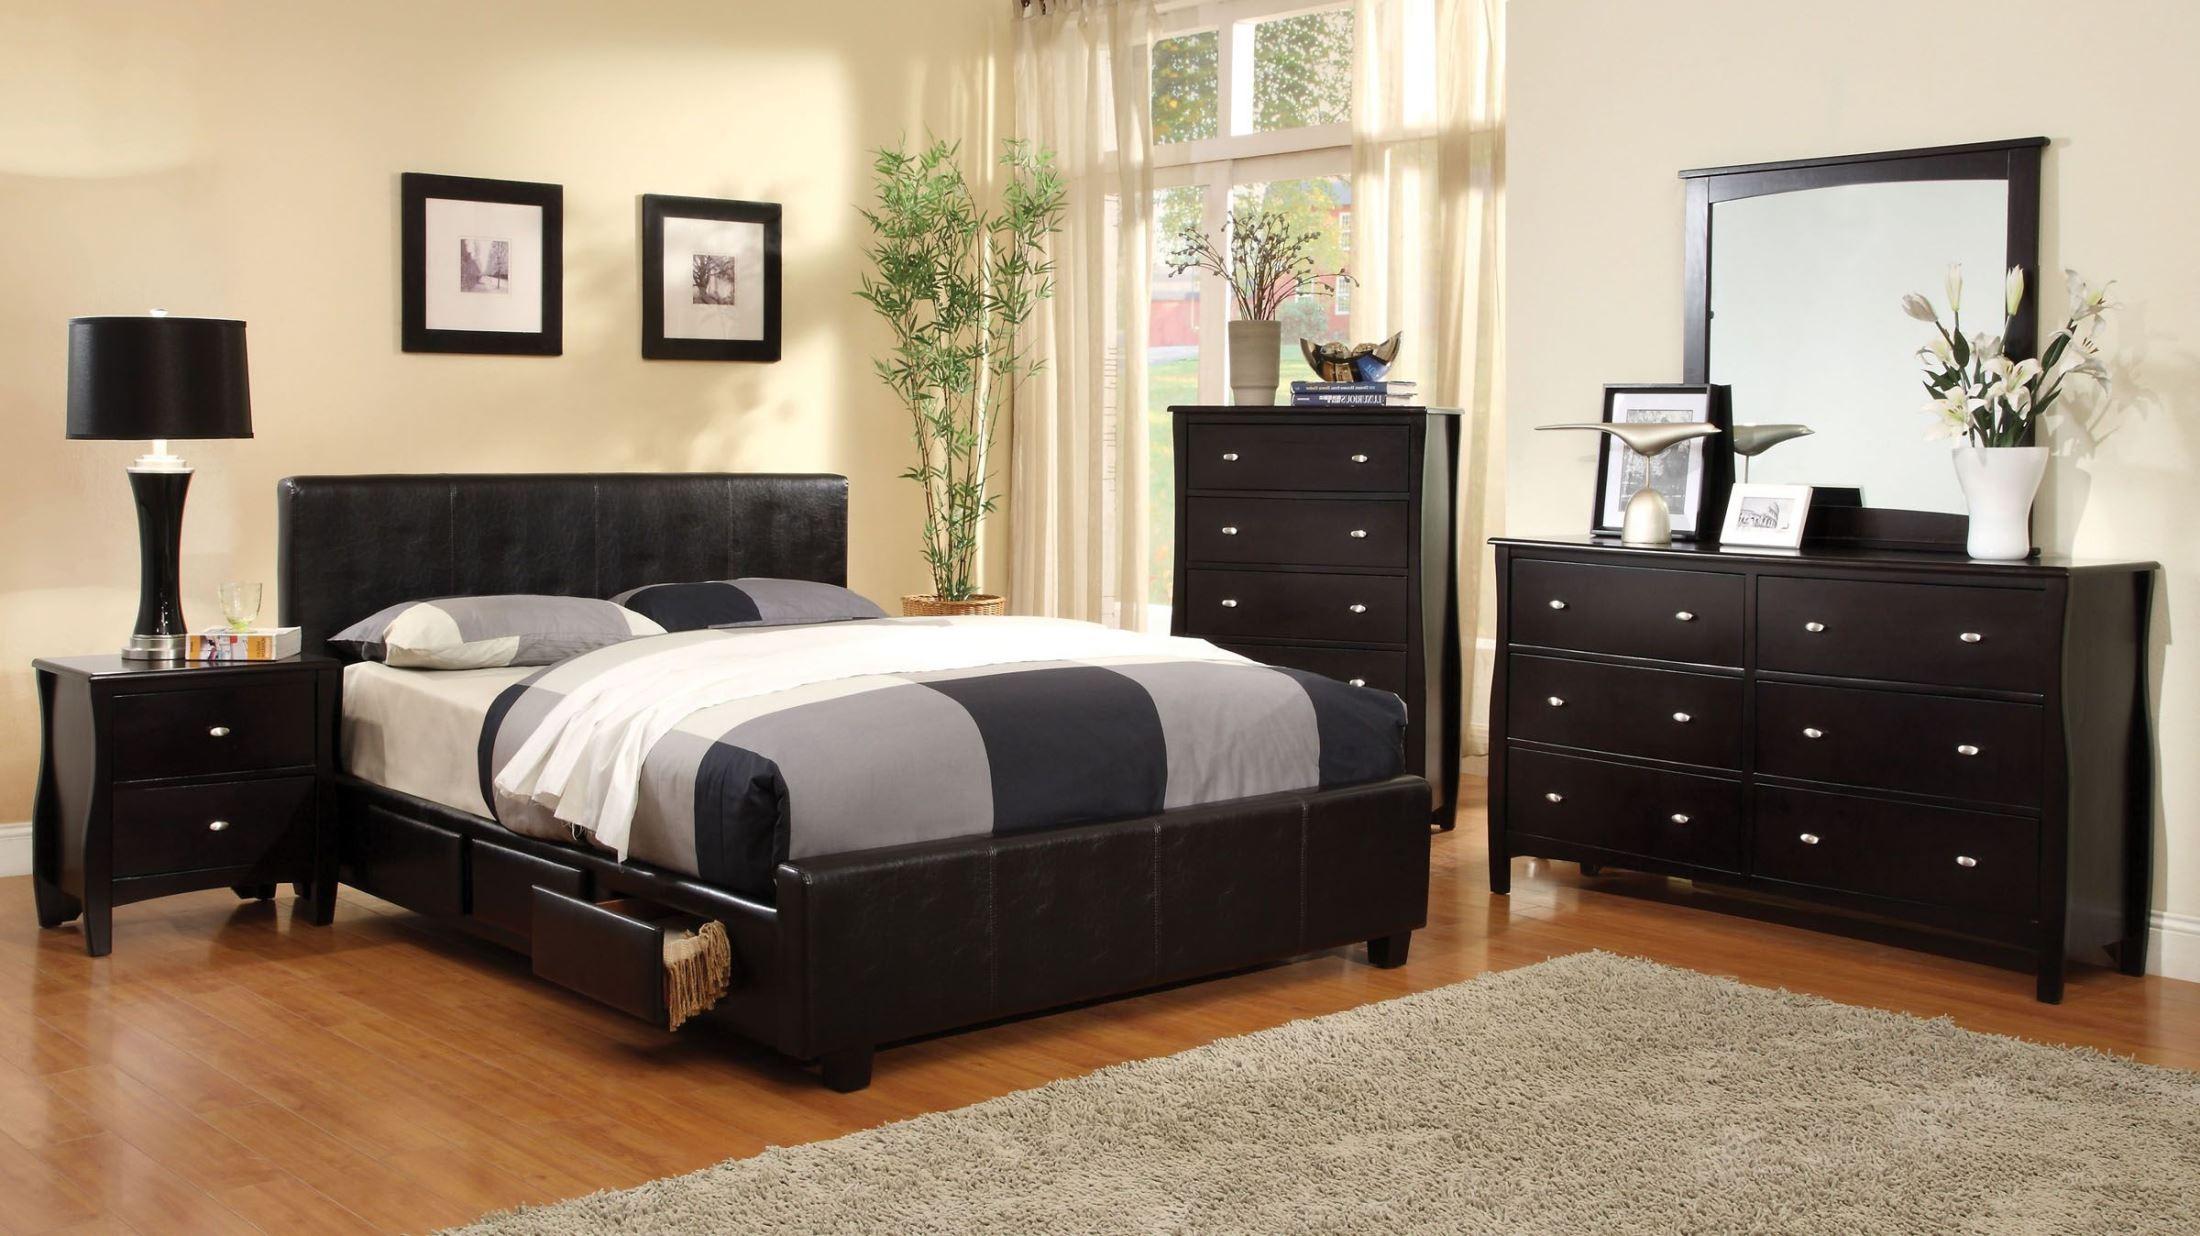 High Quality Furniture Of America. 669547. 669548